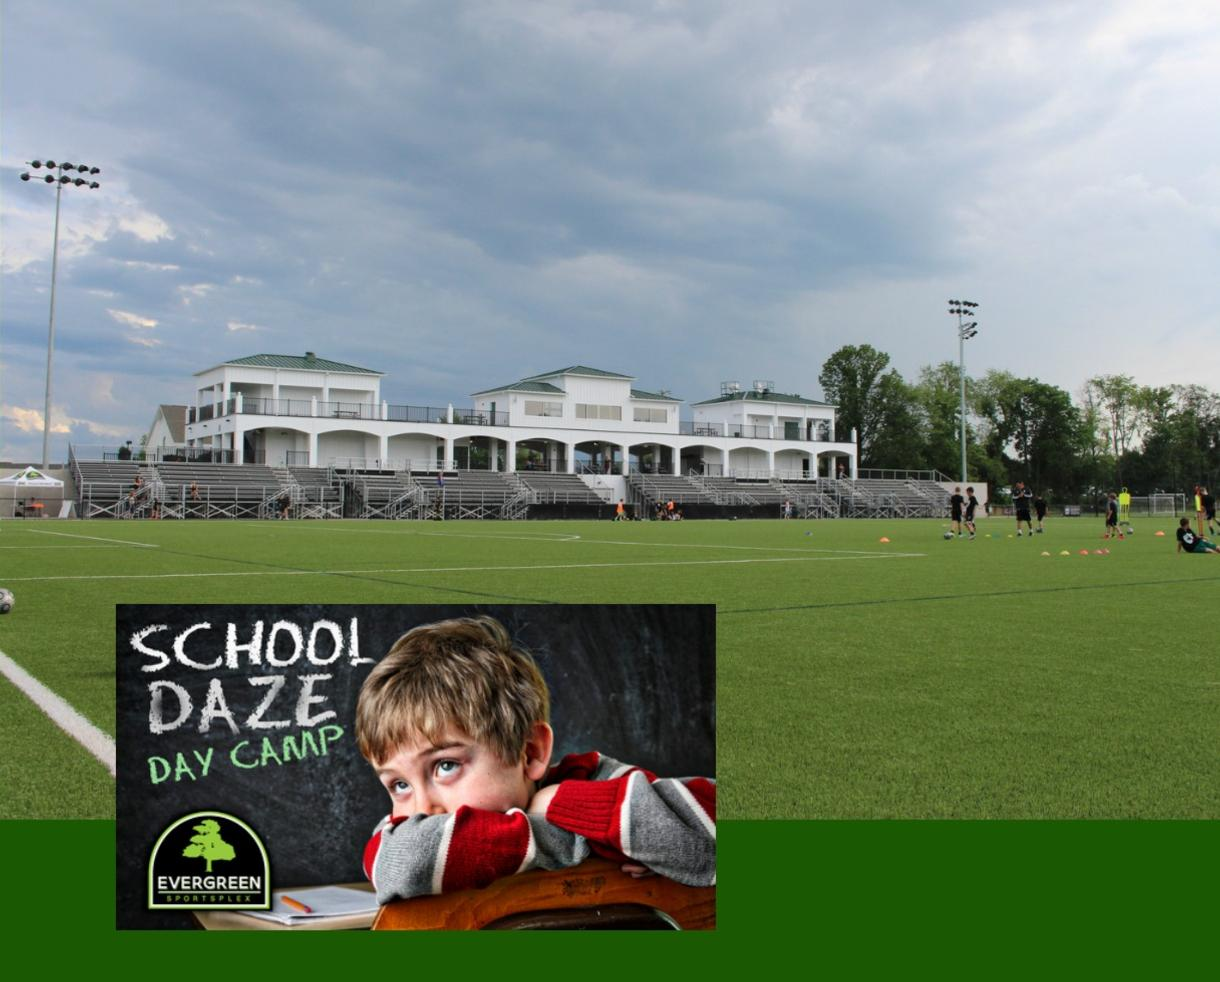 Evergreen Sportsplex School Daze One-Day Camp